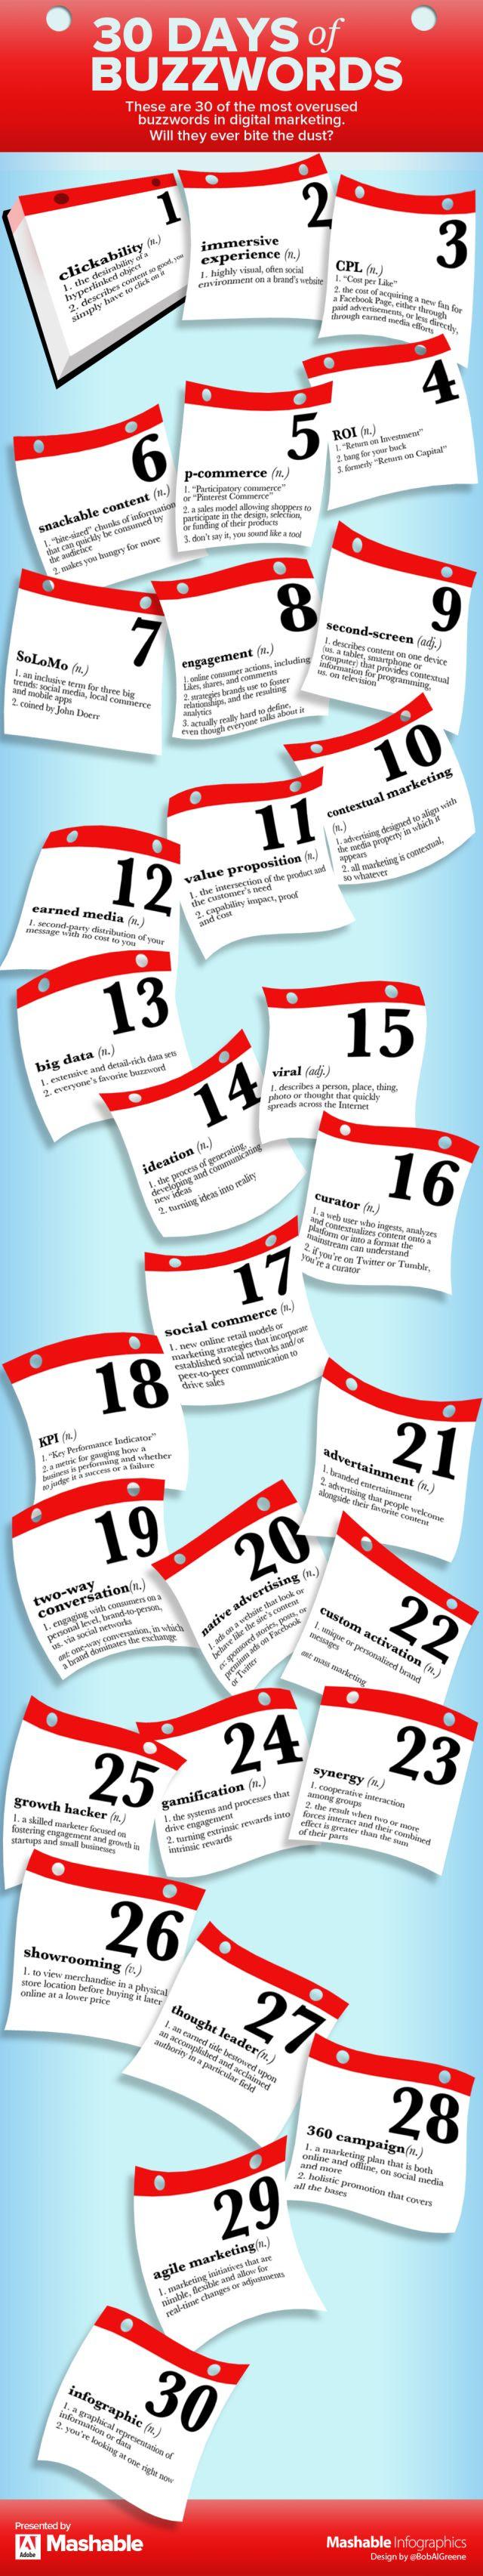 30 Days of Buzzwords